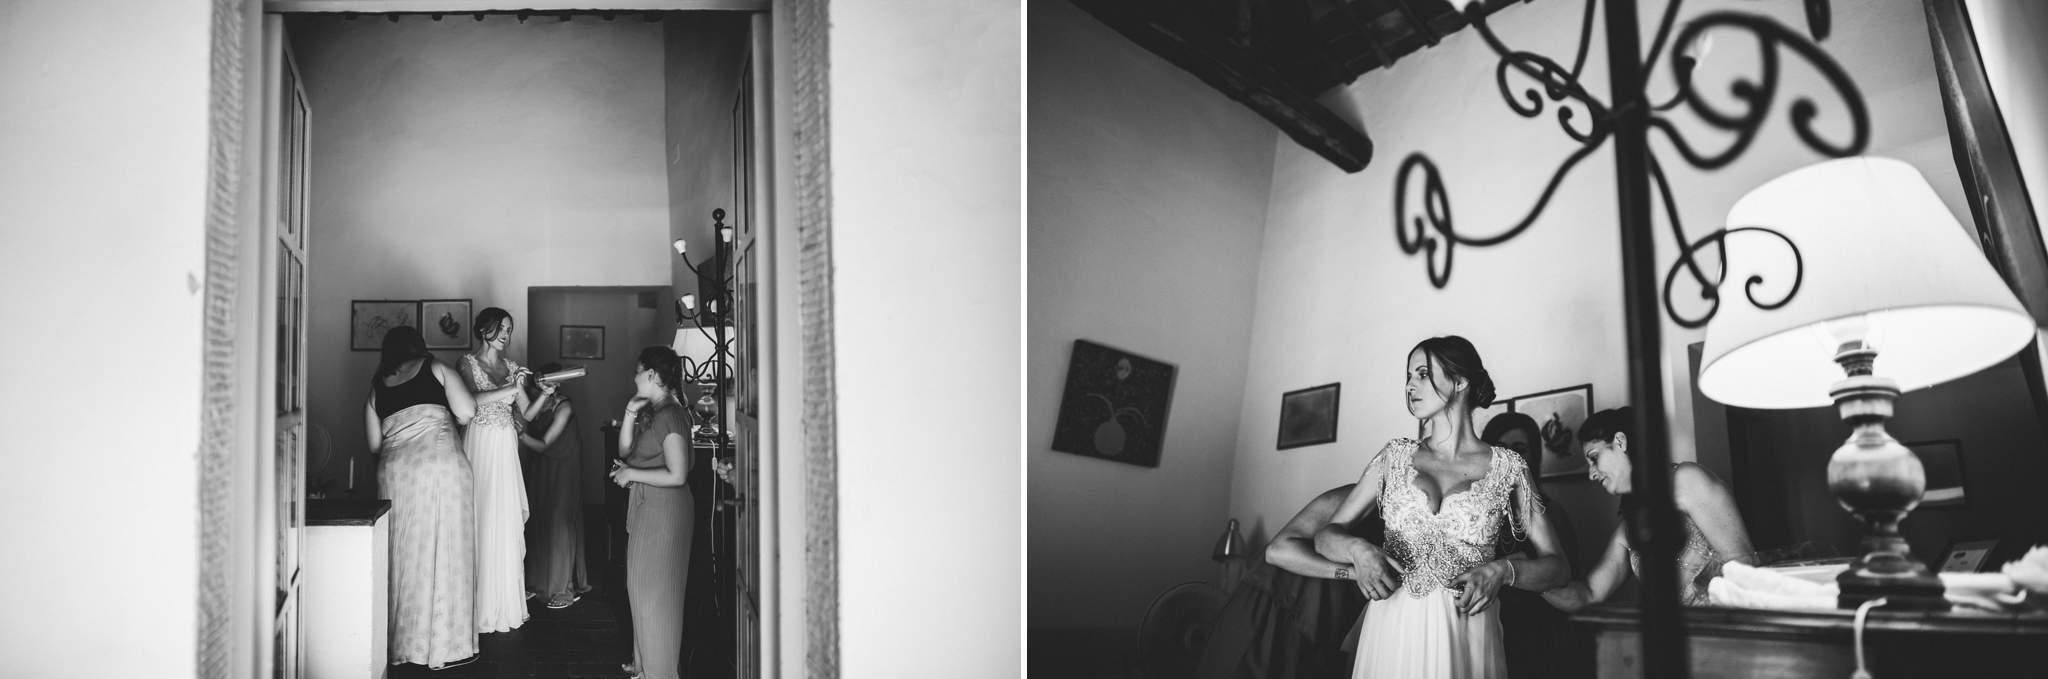 08wedding-photographer-villa-petrolo